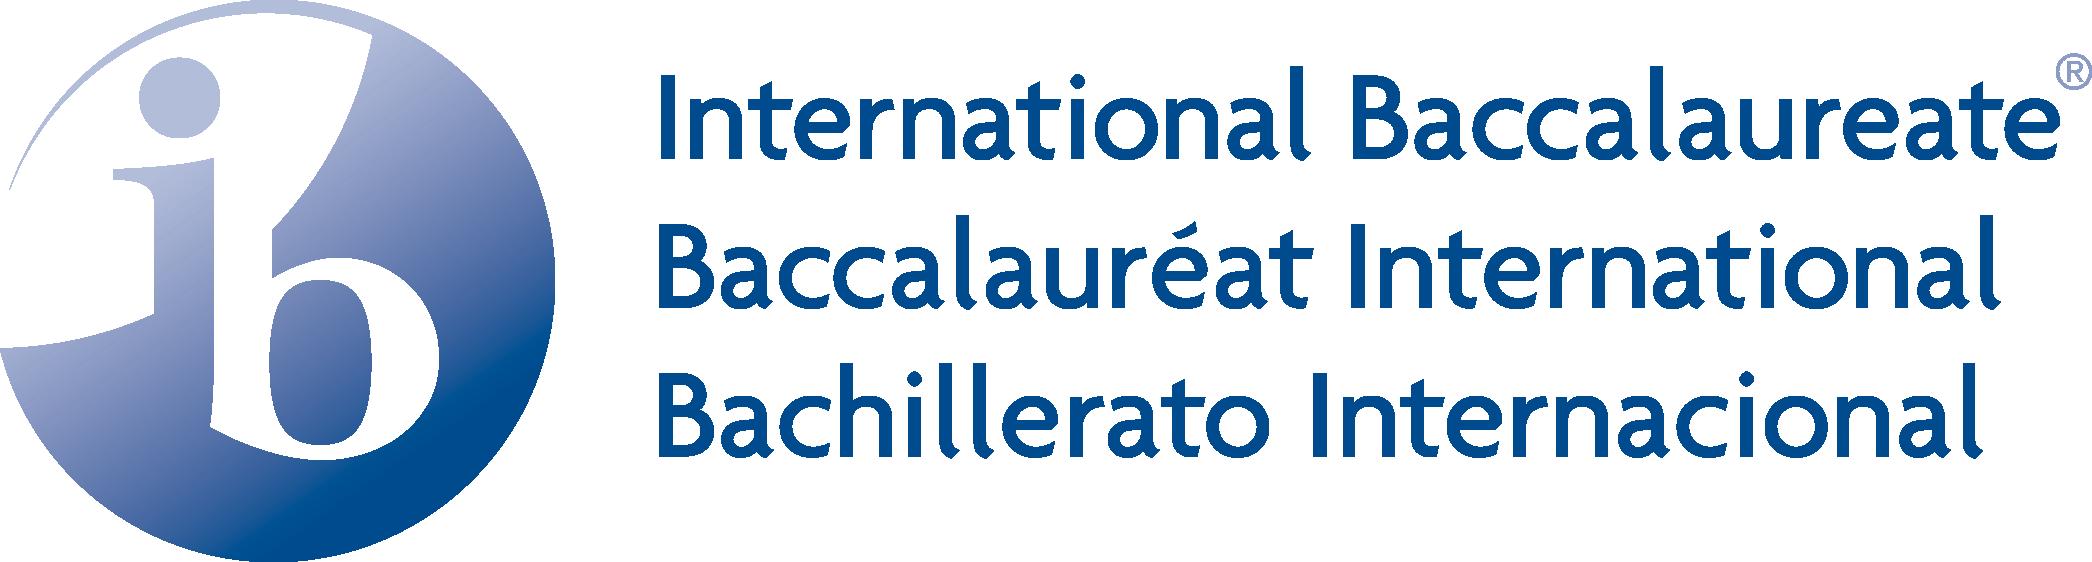 IB_logo_SC